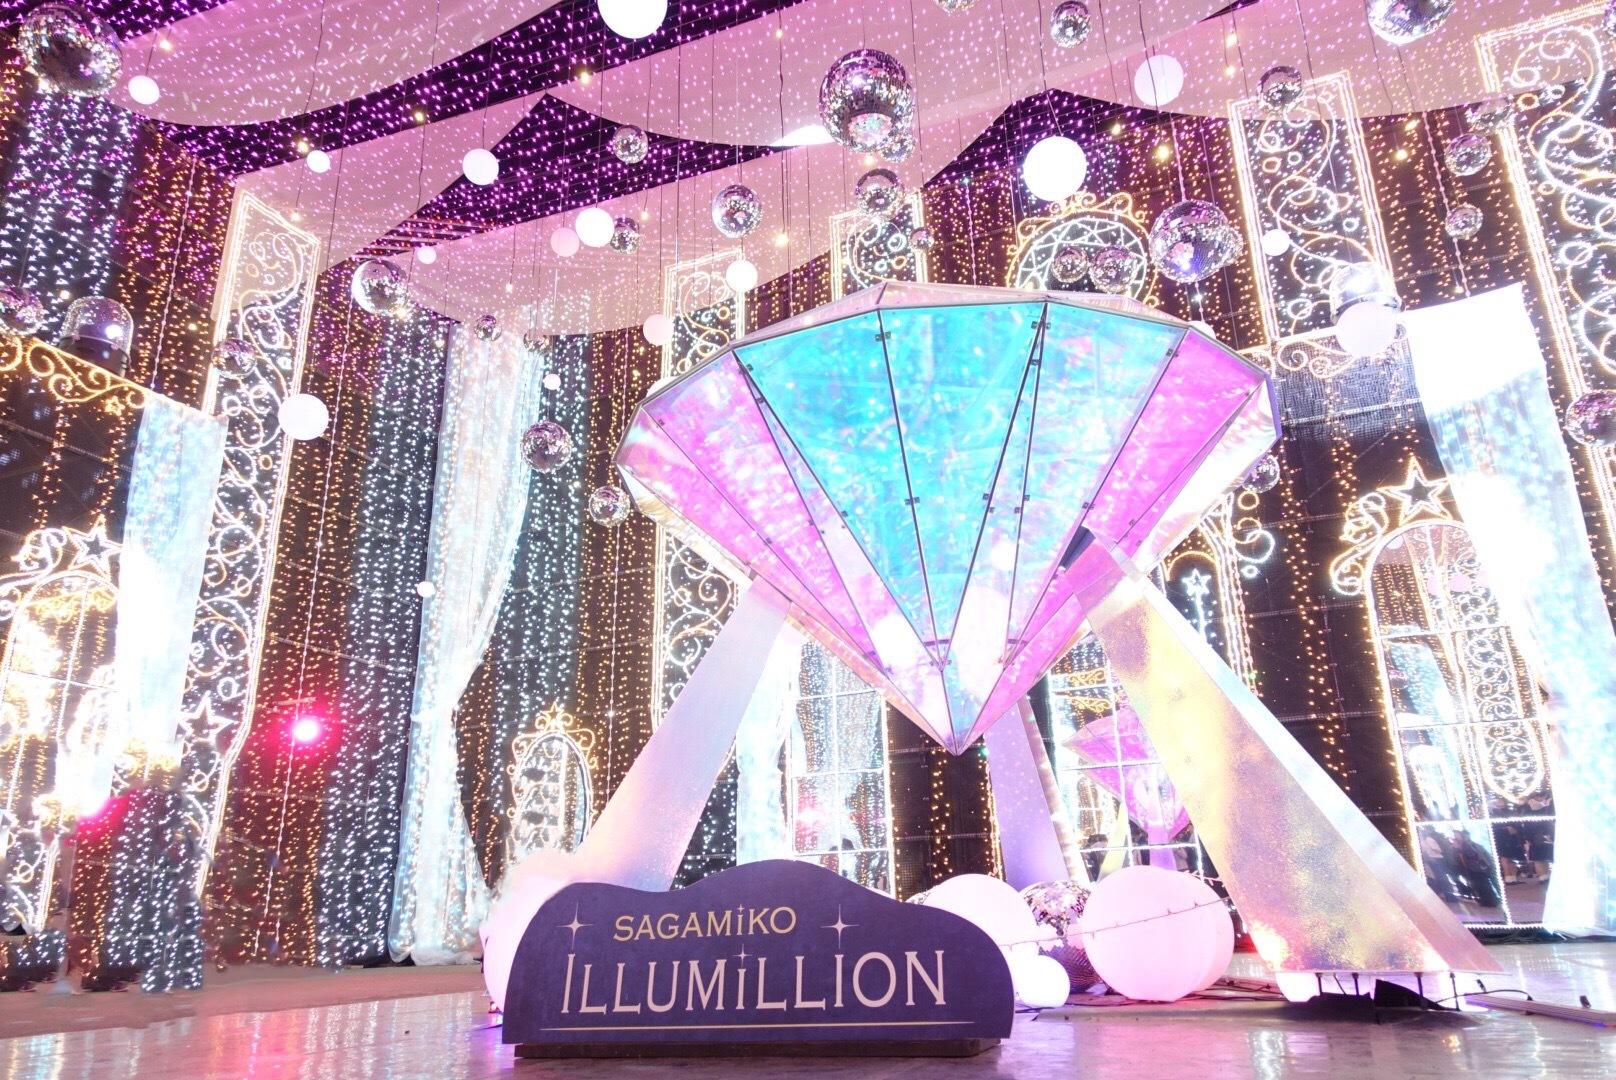 Vol.64♡ 関東最大級!600万級の光の祭典【さがみ湖イルミリオン】_1_6-1